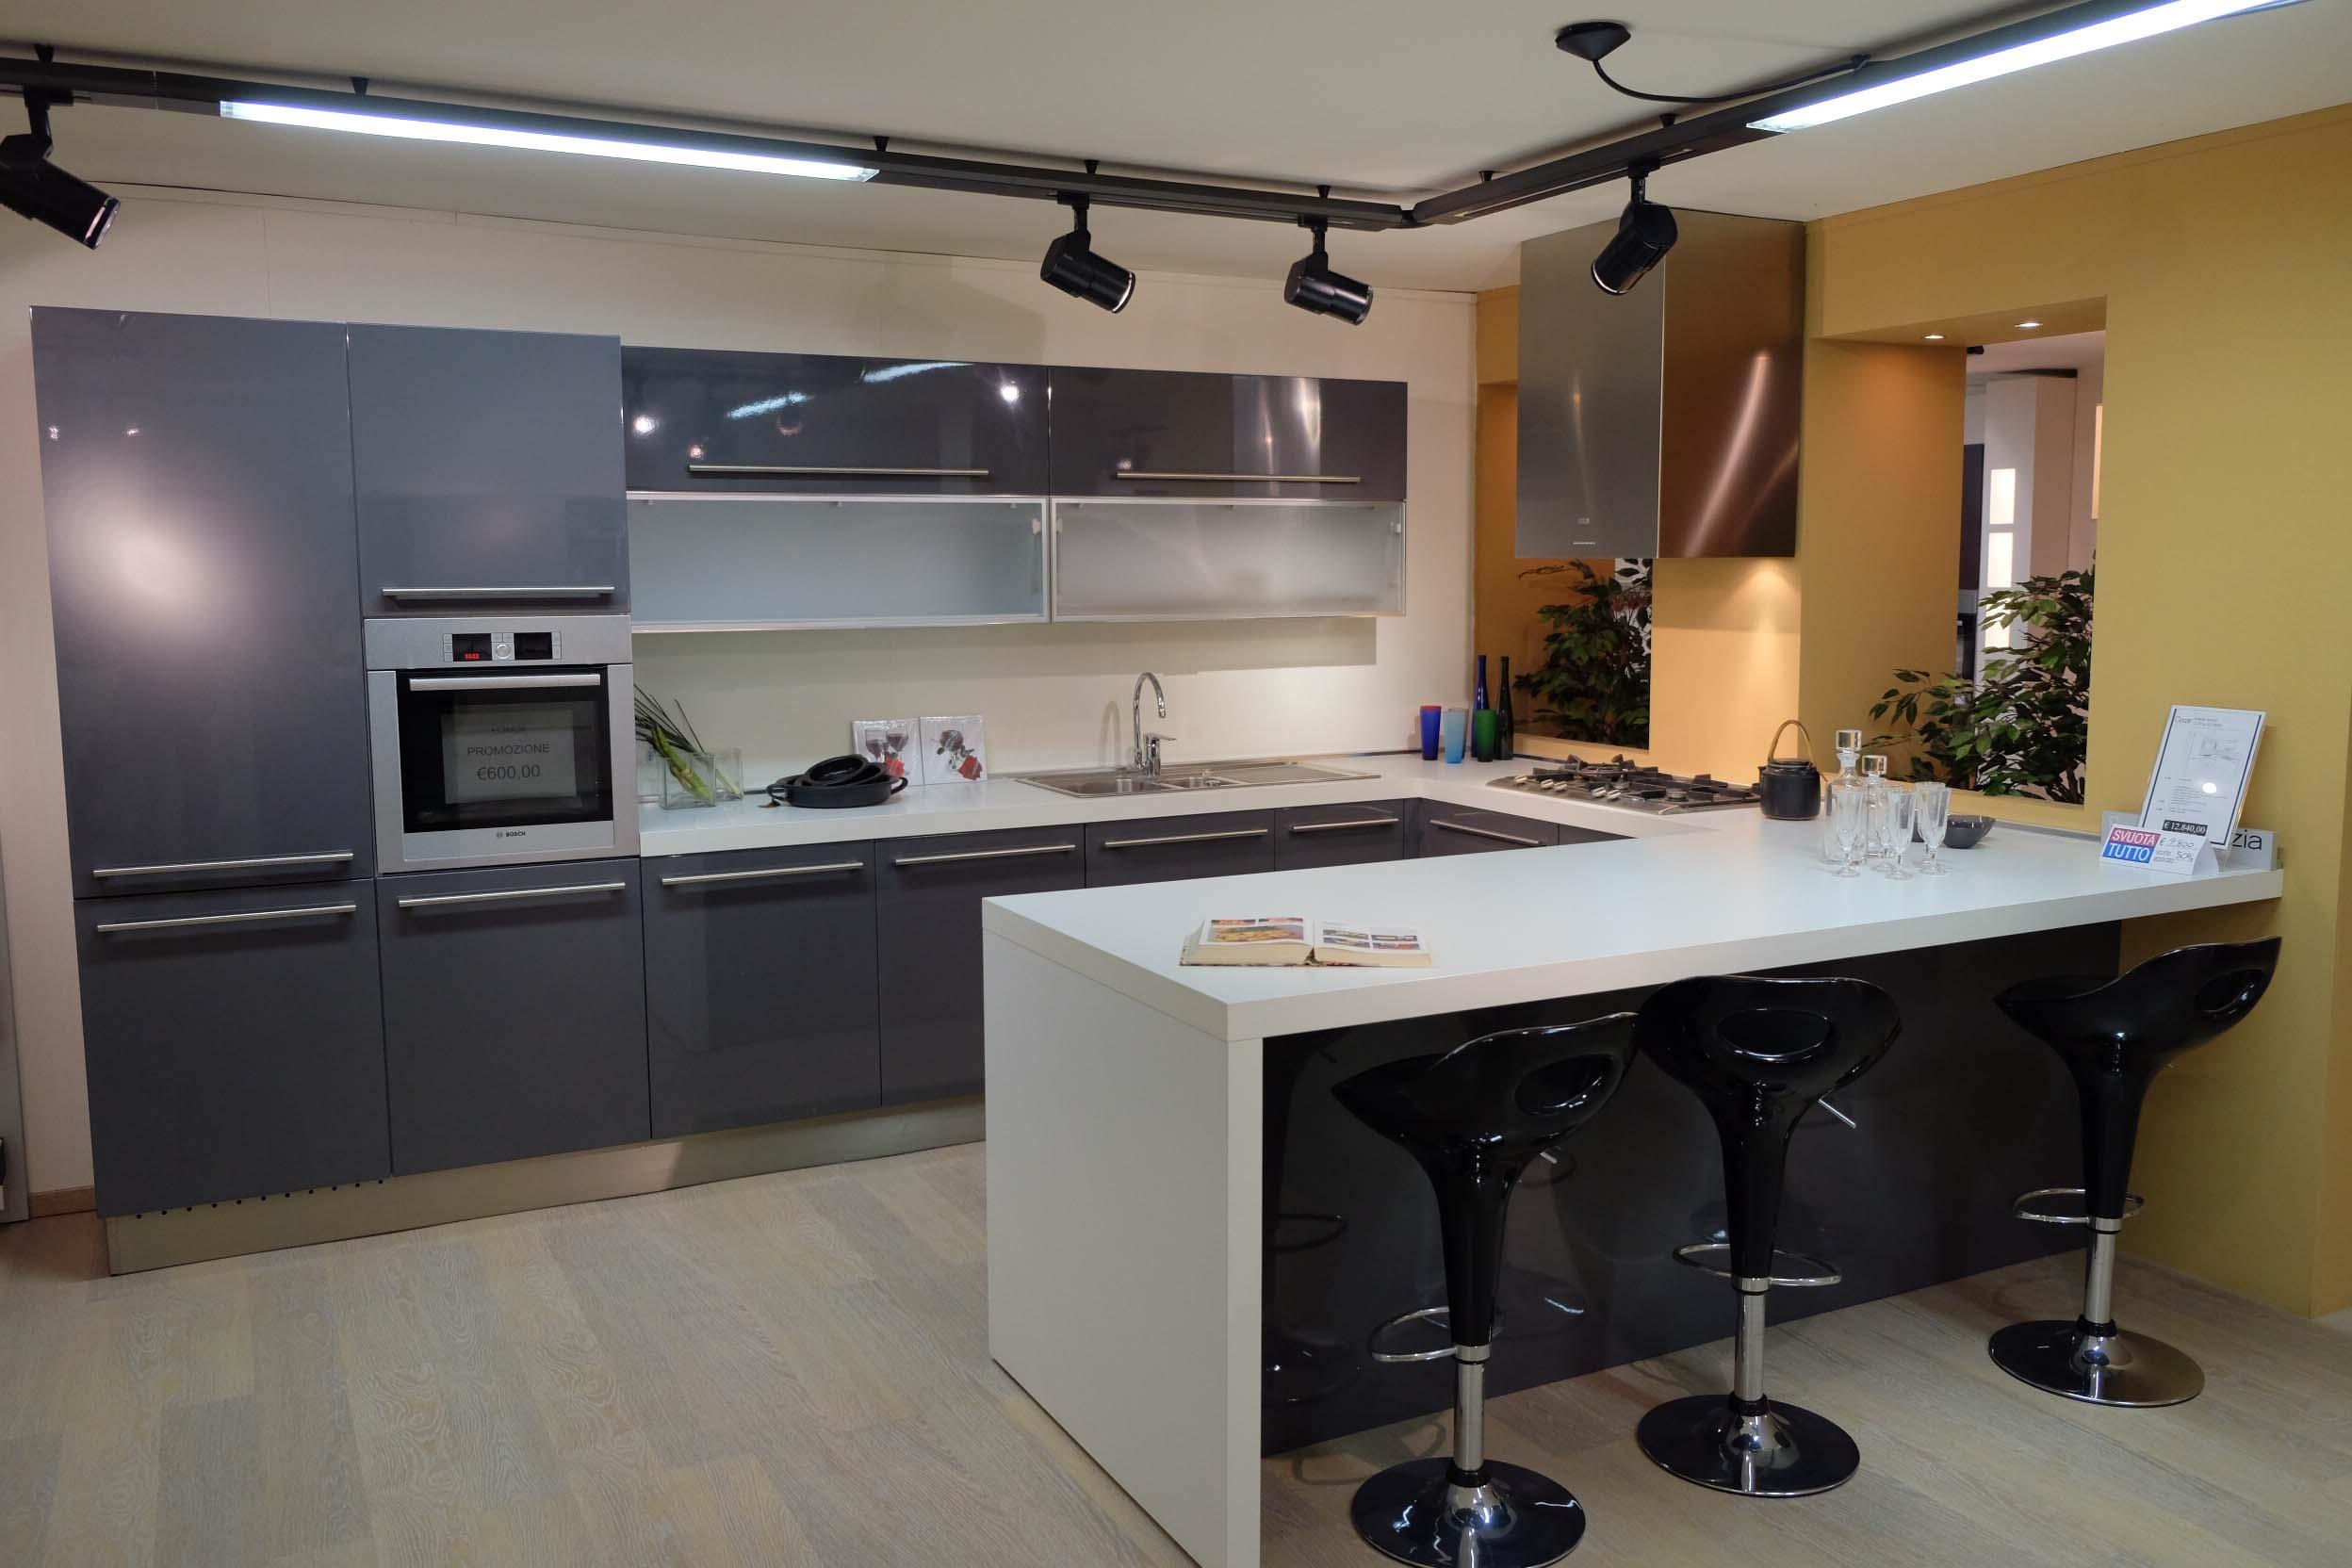 Cesar cucine cucina lucrezia laccato lucido scontata del 65 cucine a prezzi scontati - Cucine cesar prezzi ...